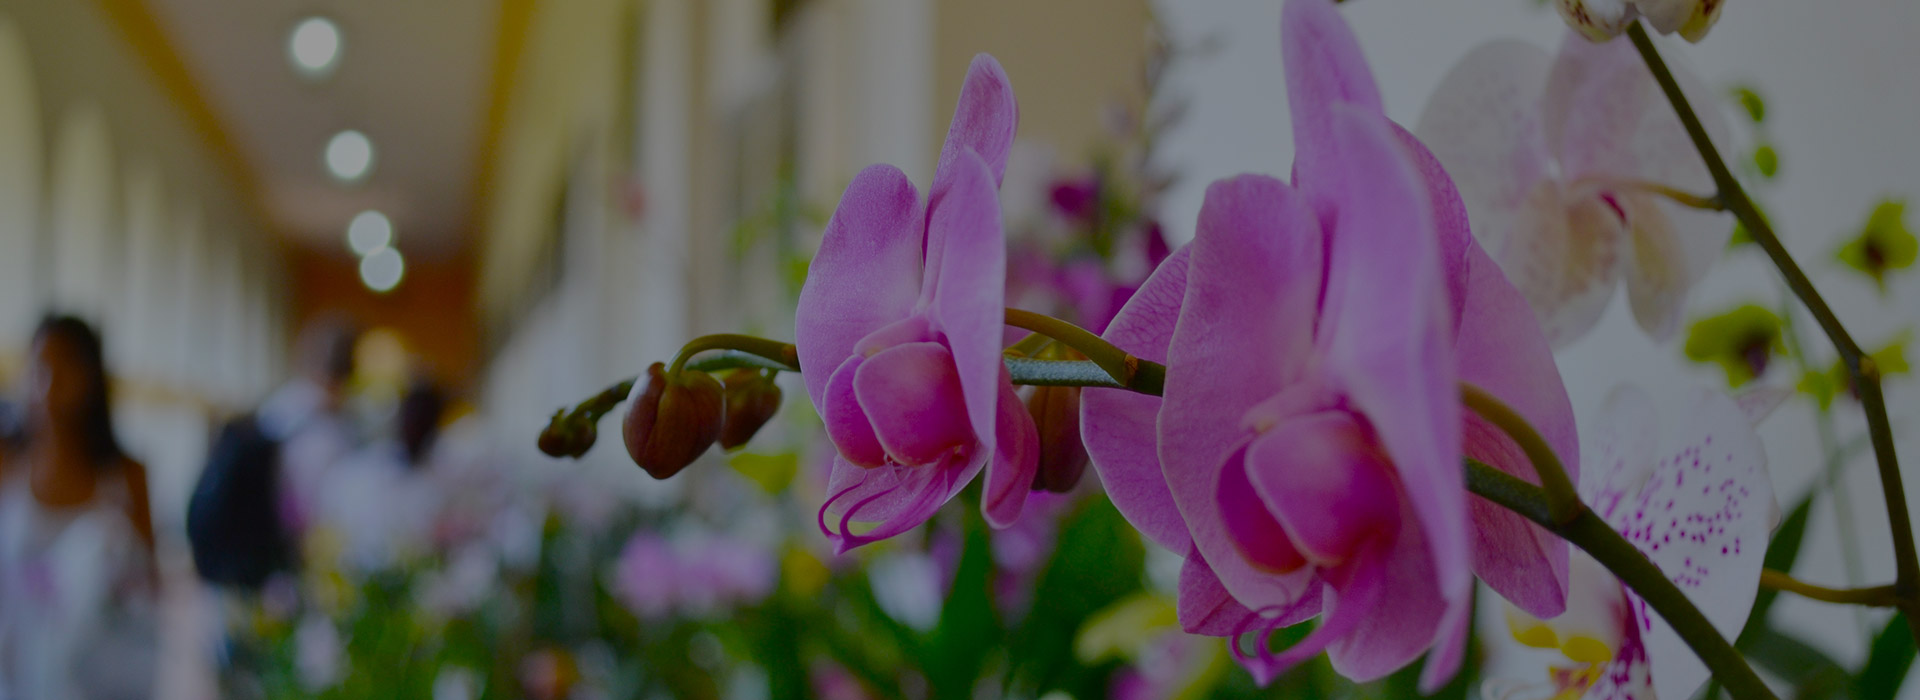 Curso de Orquídeas 2019